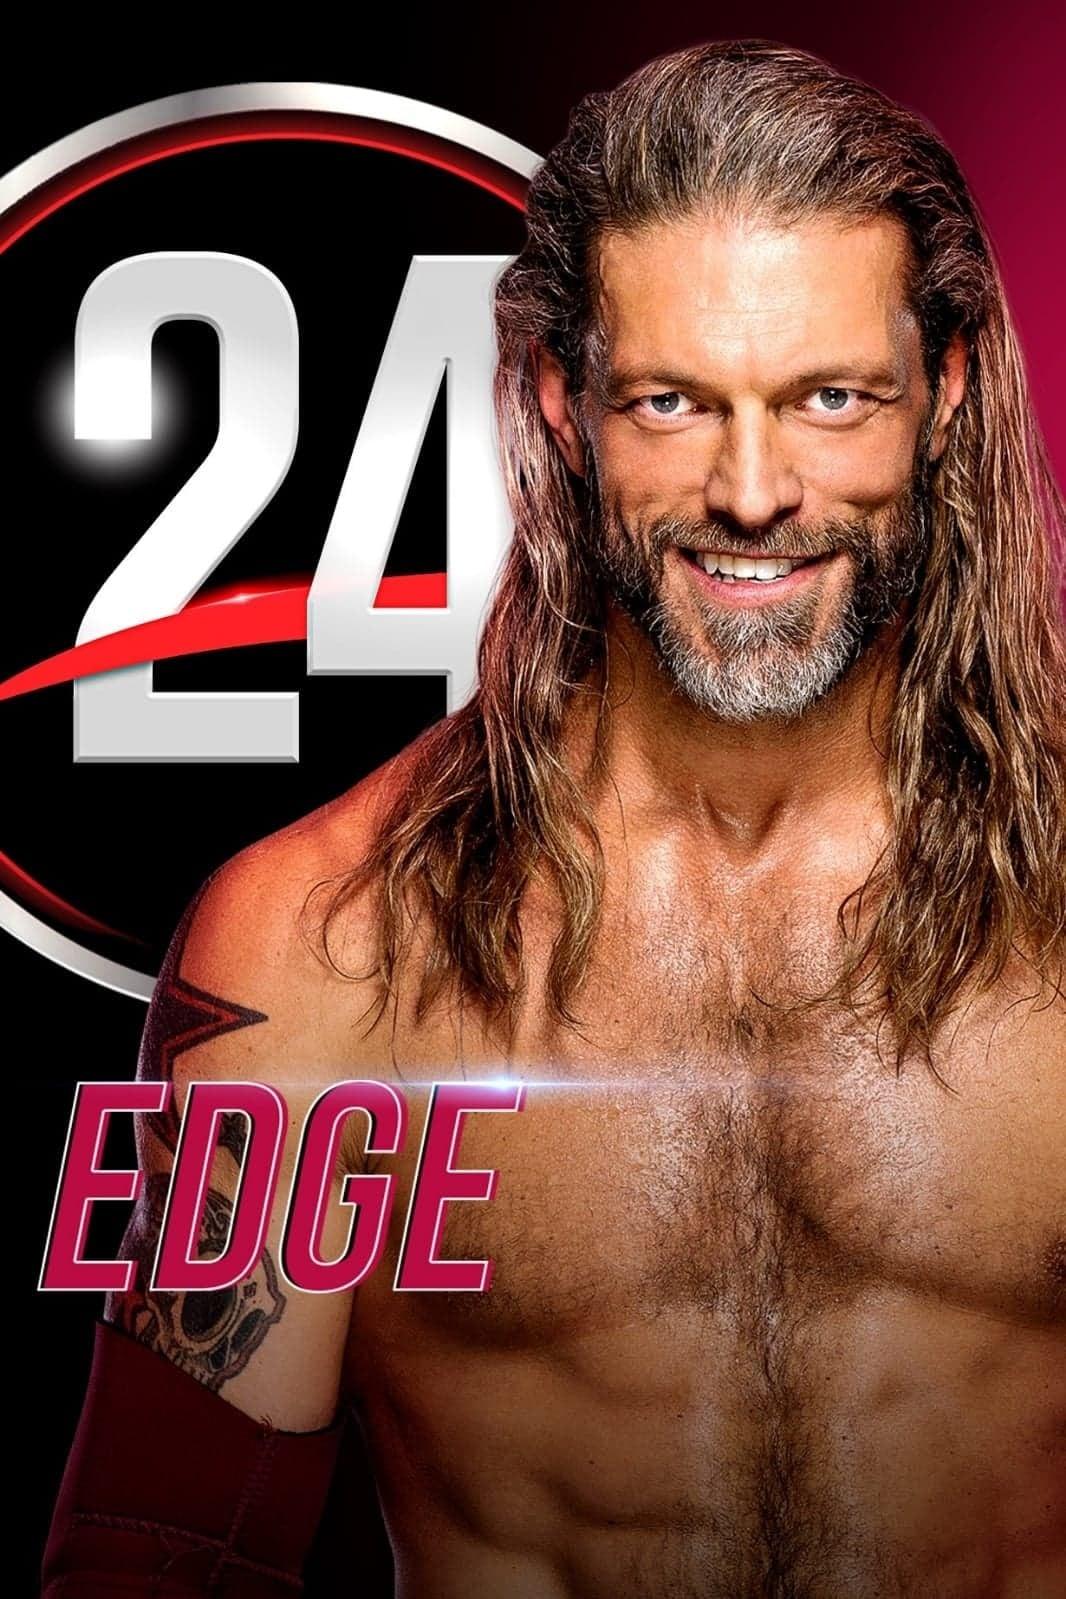 Edge: The Second Mountain